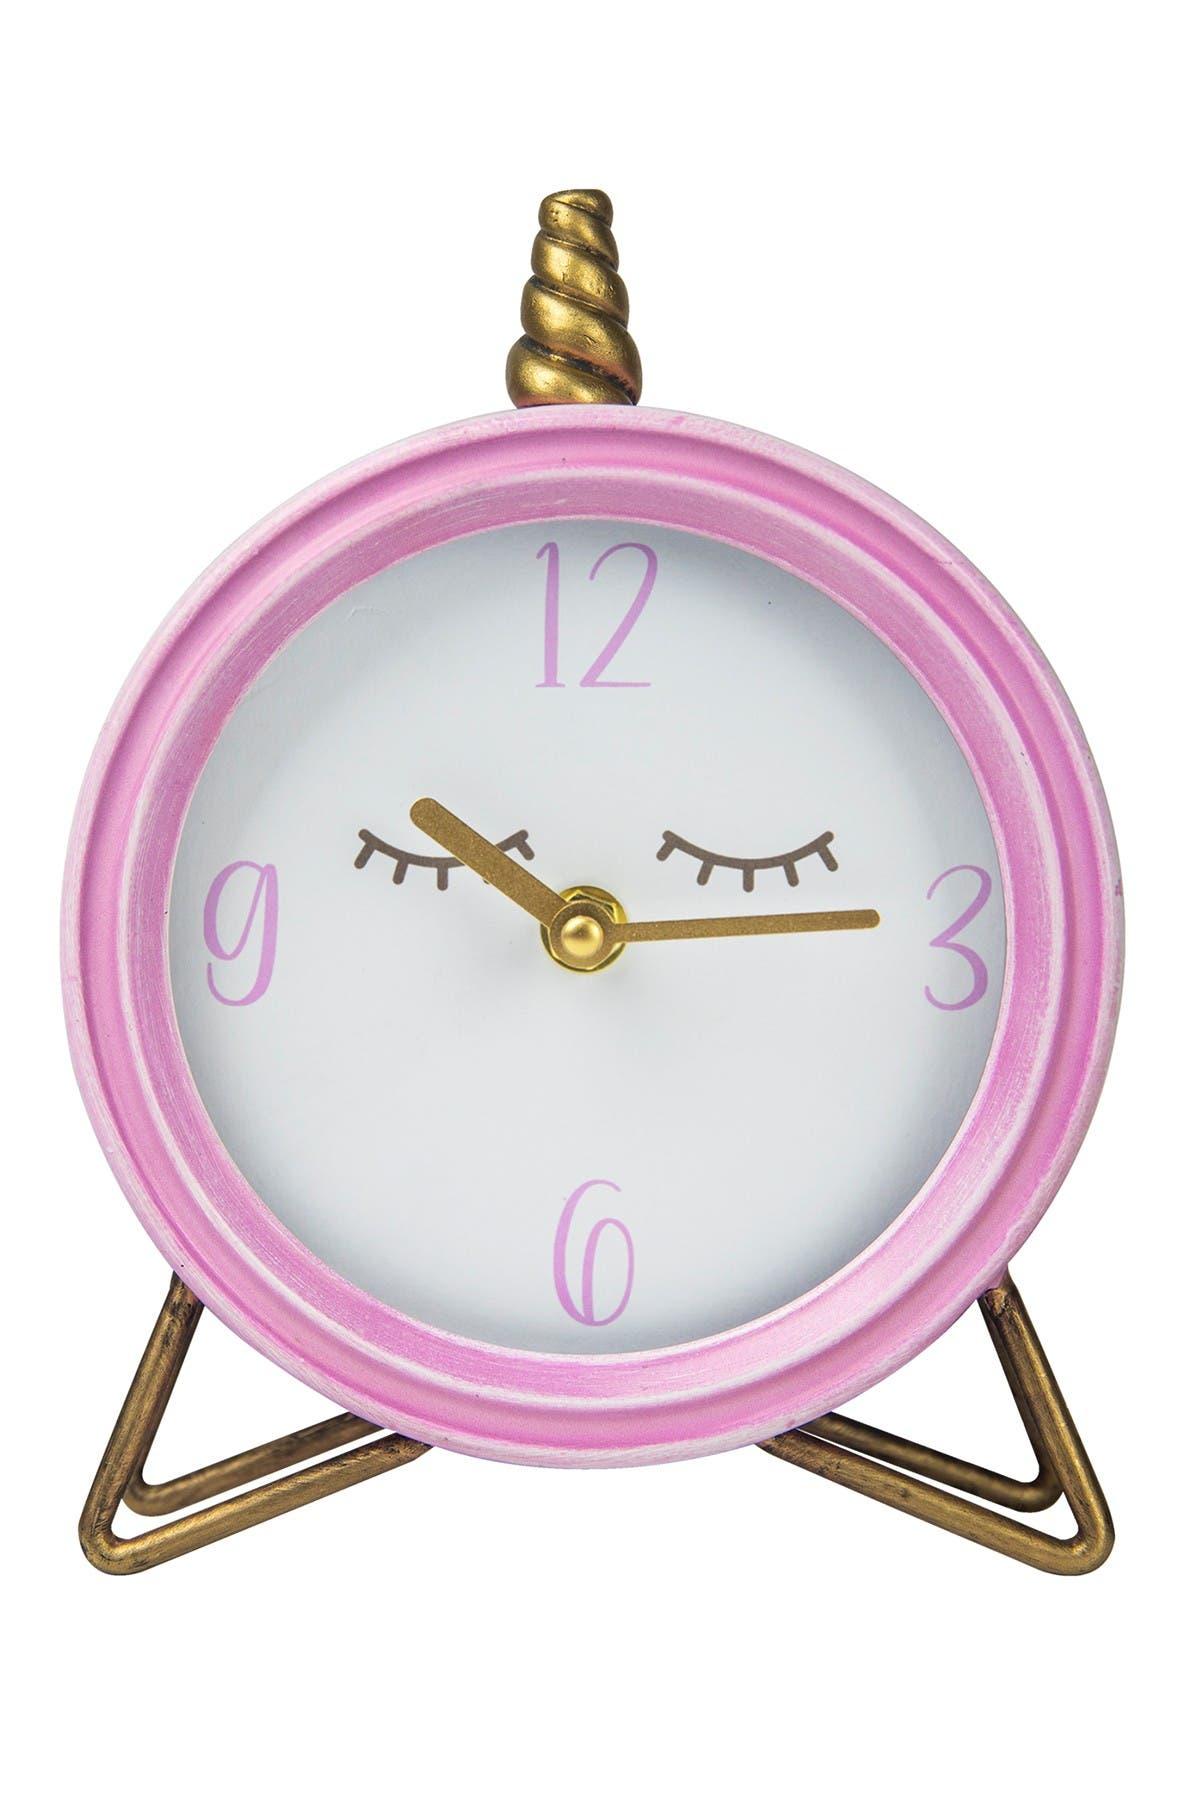 Image of Stratton Home Unicorn Tabletop Clock